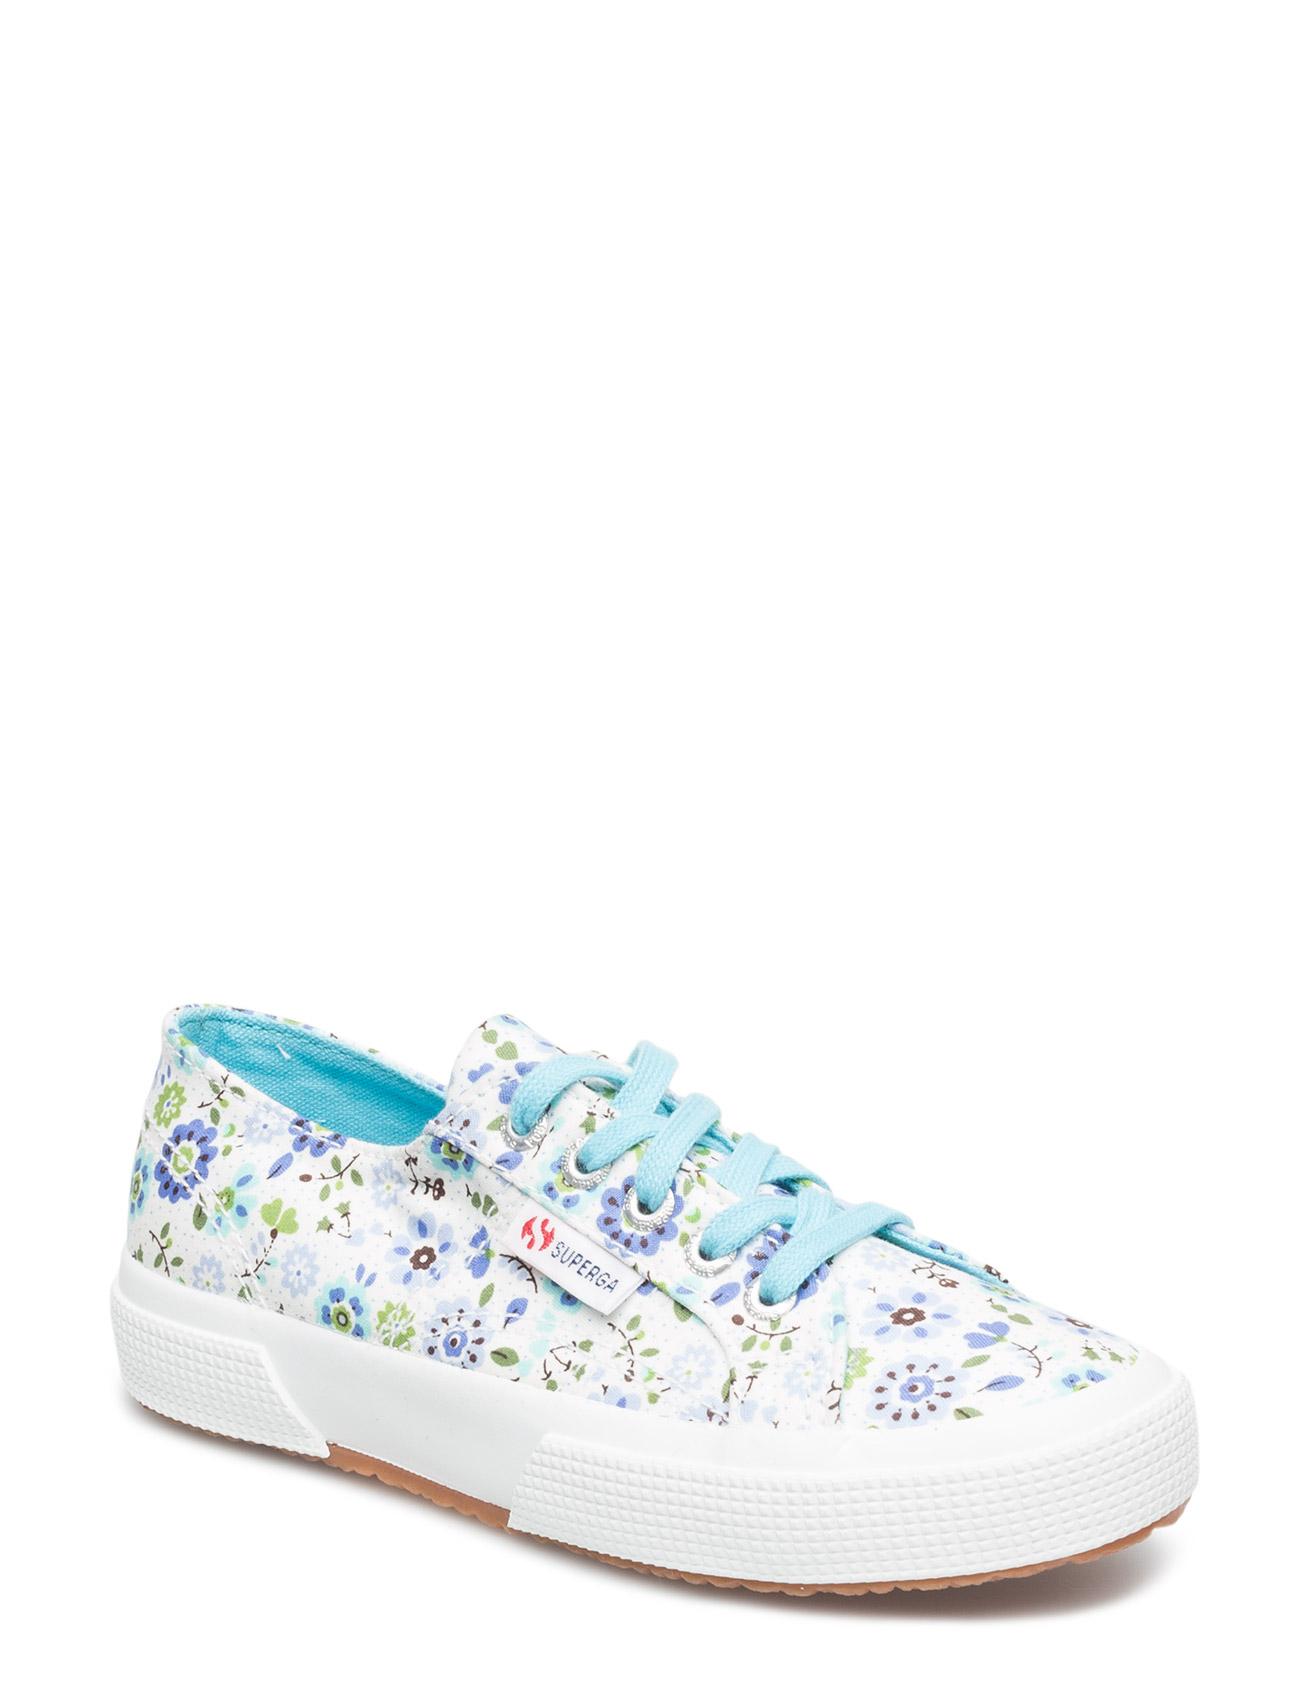 Superga 2750 Cotflowersj Flowers Superga Sko & Sneakers til Børn i